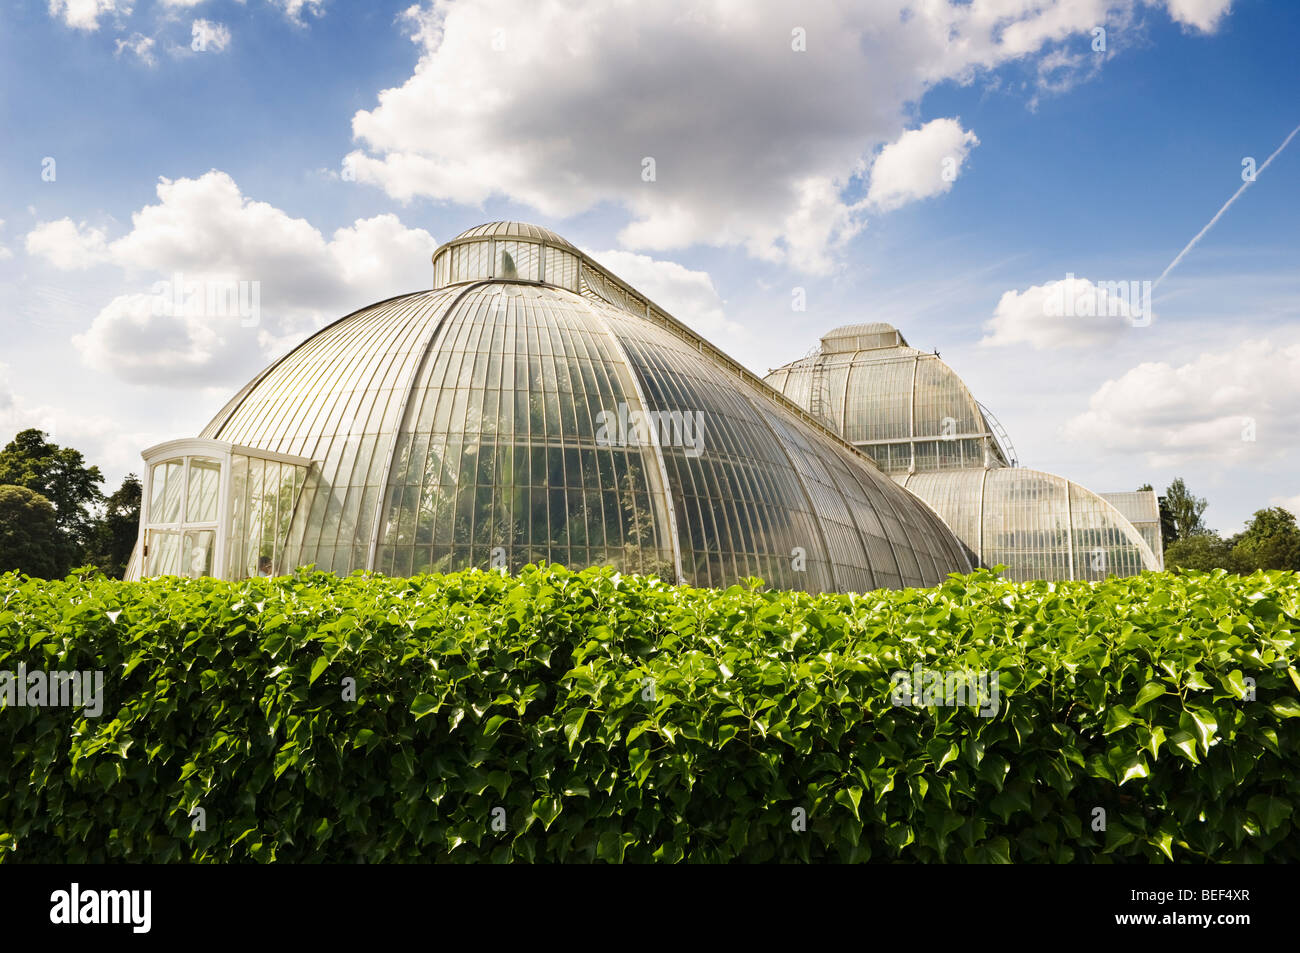 History Of The Royal Botanic Garden Kew Stock Photos & History Of ...